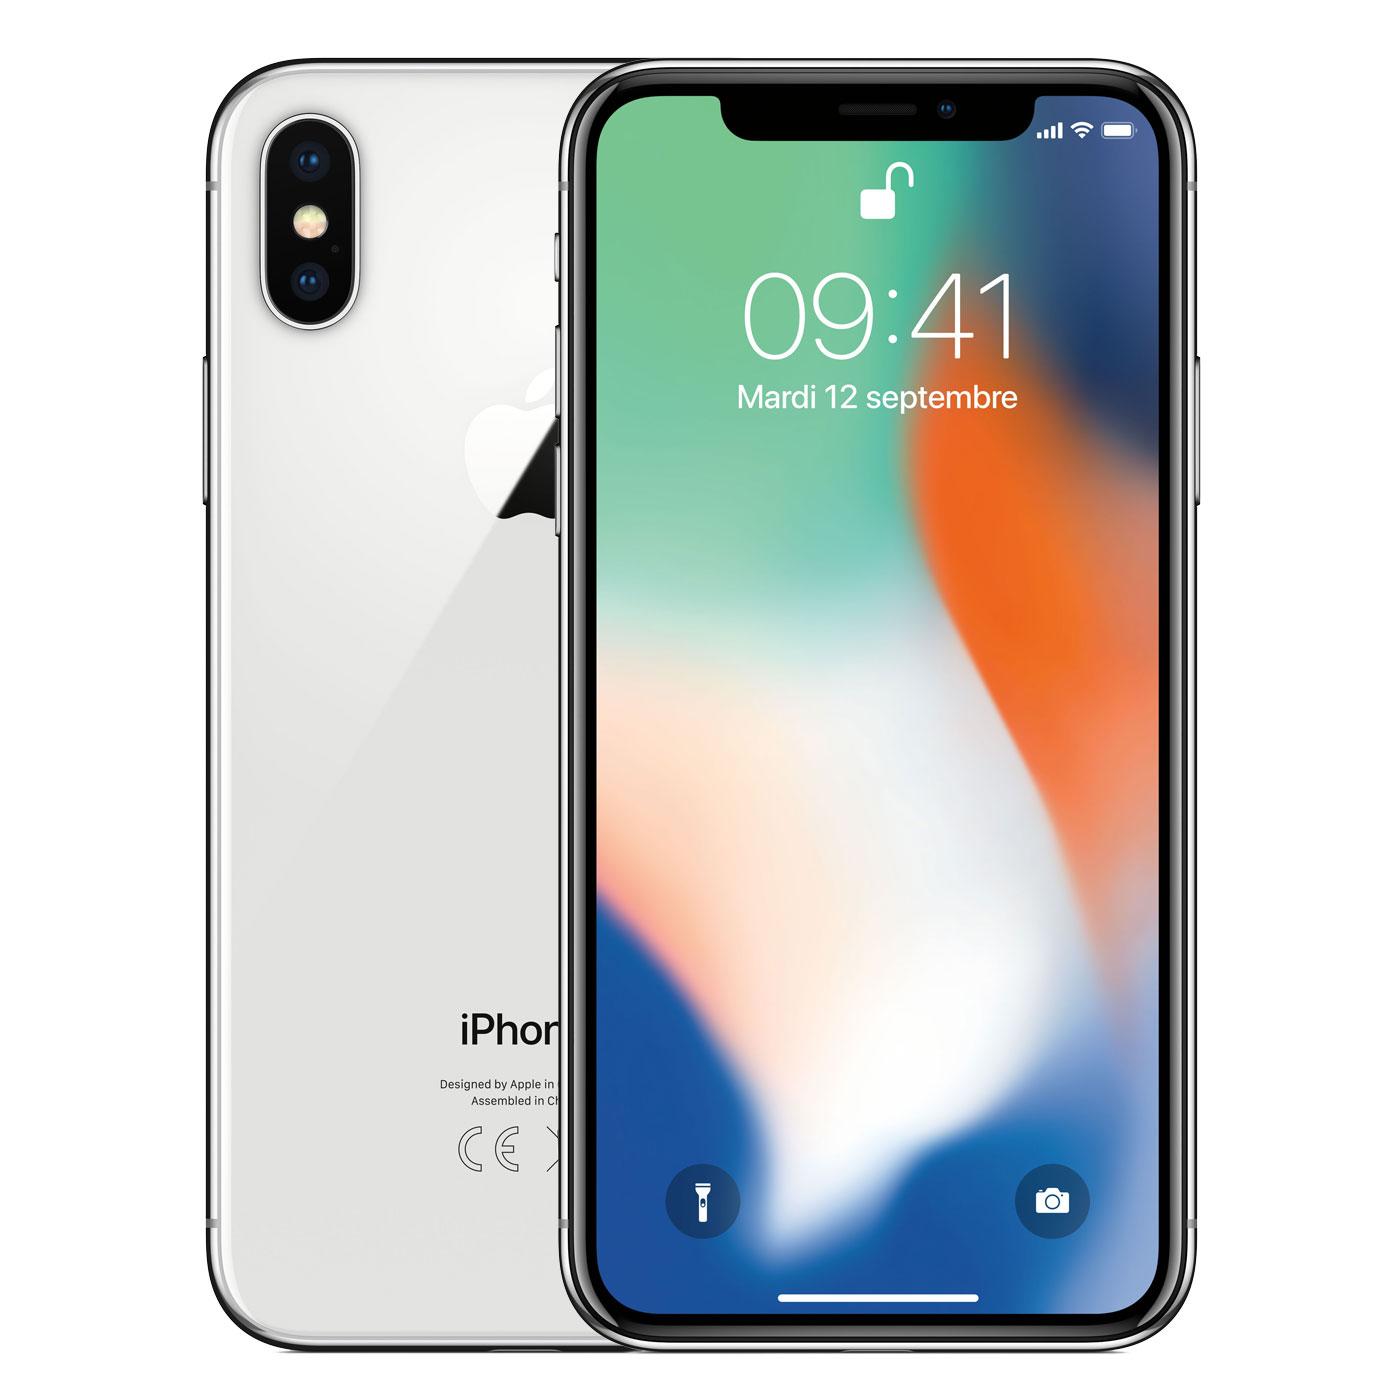 Apple iPhone X 256Go Argent - Téléphonie Apple - Cybertek.fr - 0